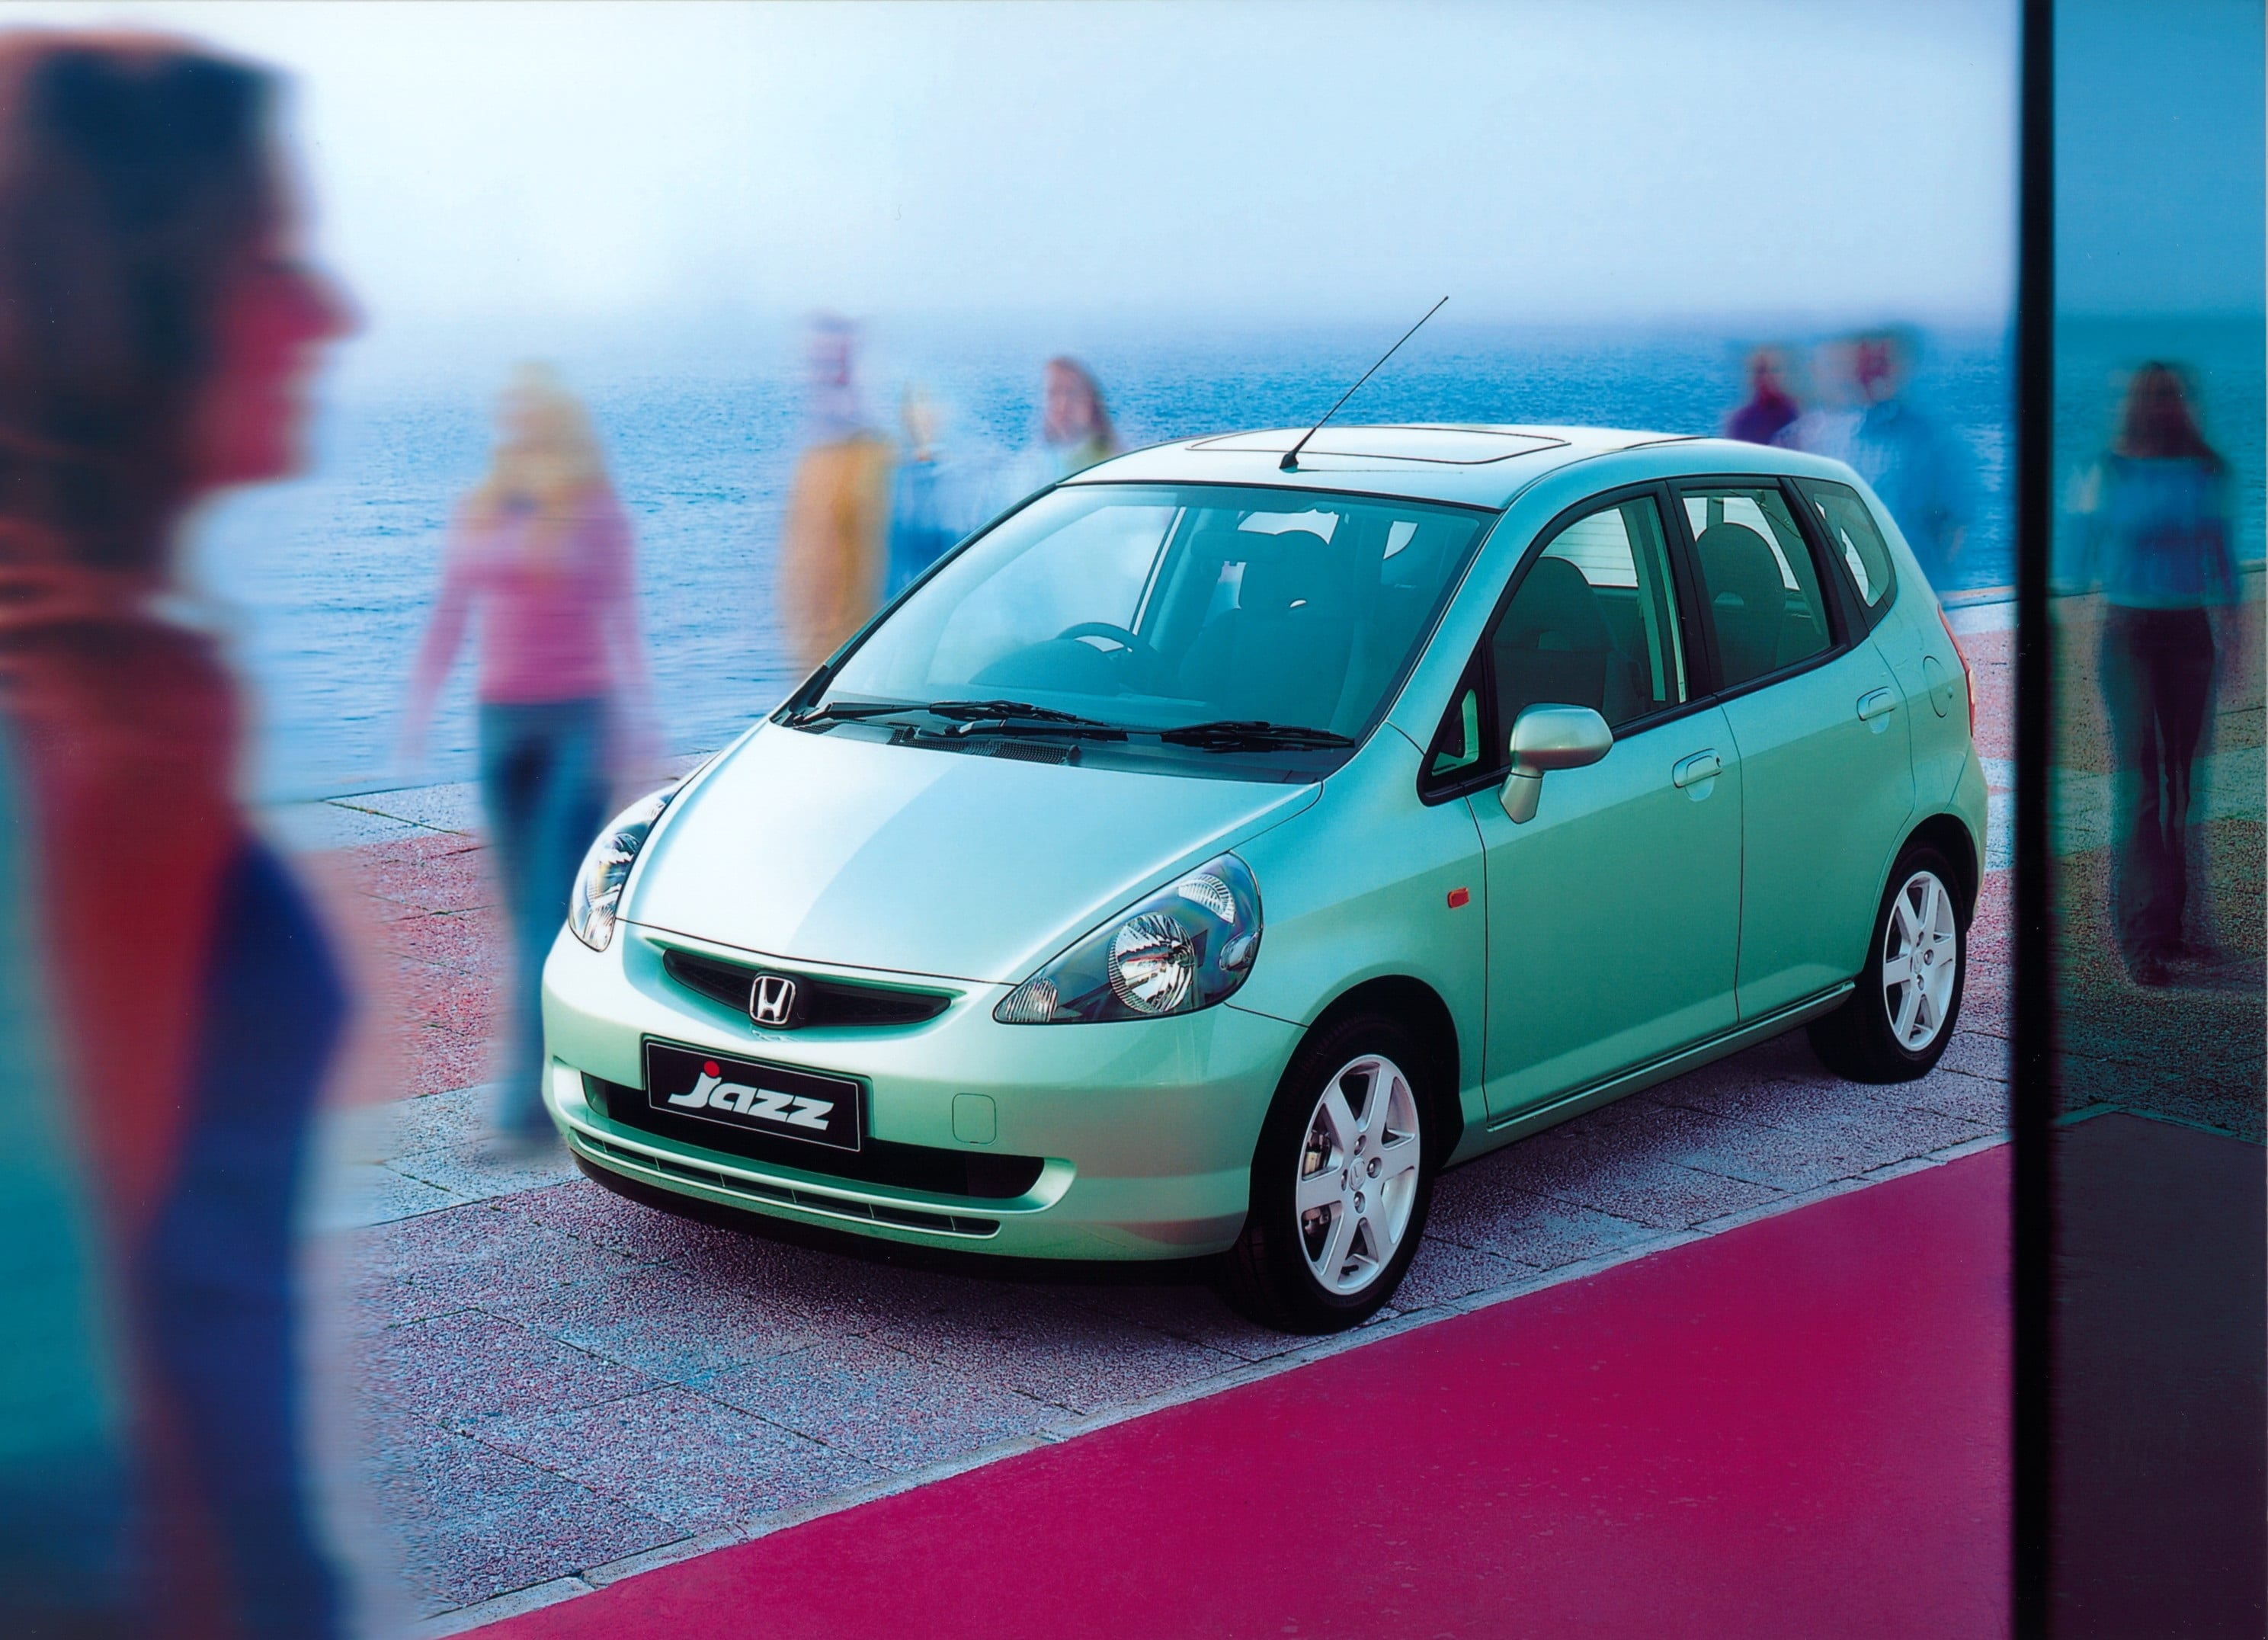 Honda, Honda Jazz, slow driver, motoring, automotive, car, cars, ebay, ebay motors, autotrader, not2grand, www.not2grand.co.uk, classi car, retro car, adrian flux, featured